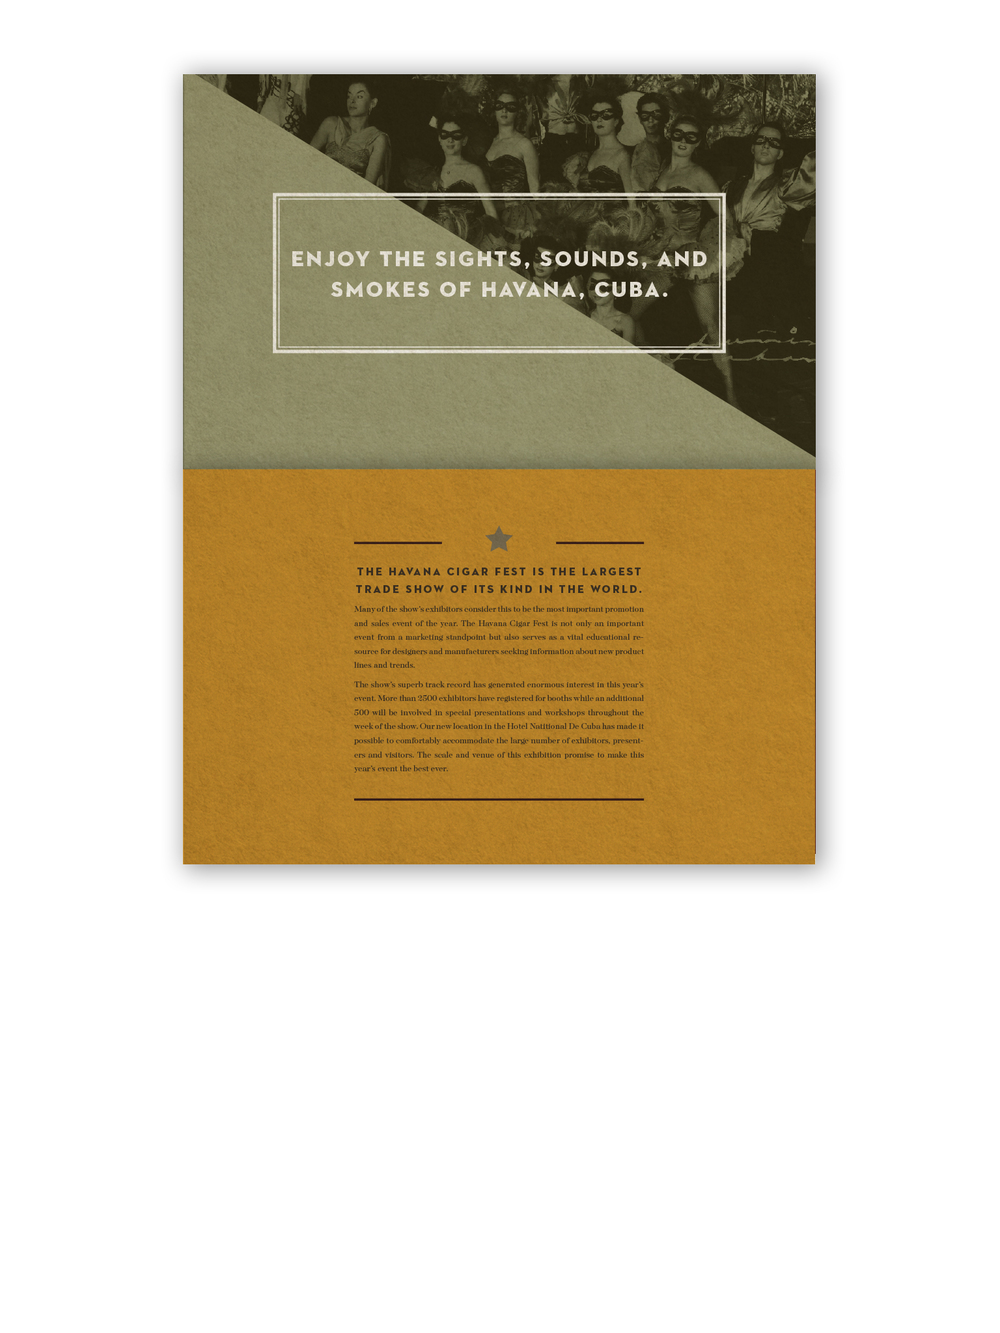 havanacigarfest brochure half closed.jpg